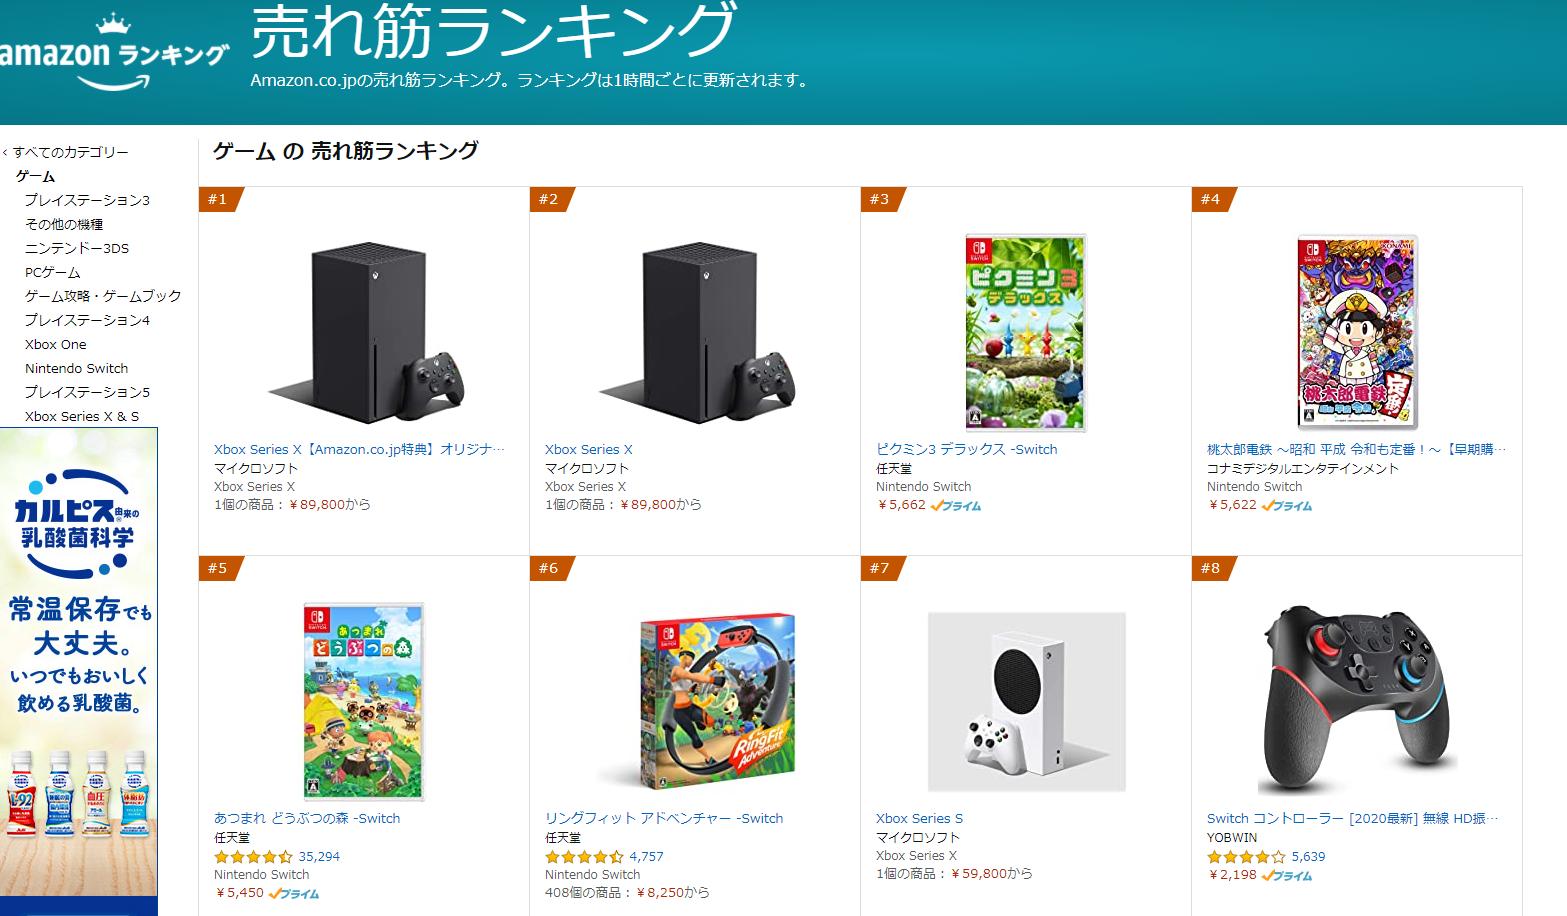 Amazon売れ筋ランキングで「Xbox Series X」「Xbox Series S」がランクインしているぞ!!